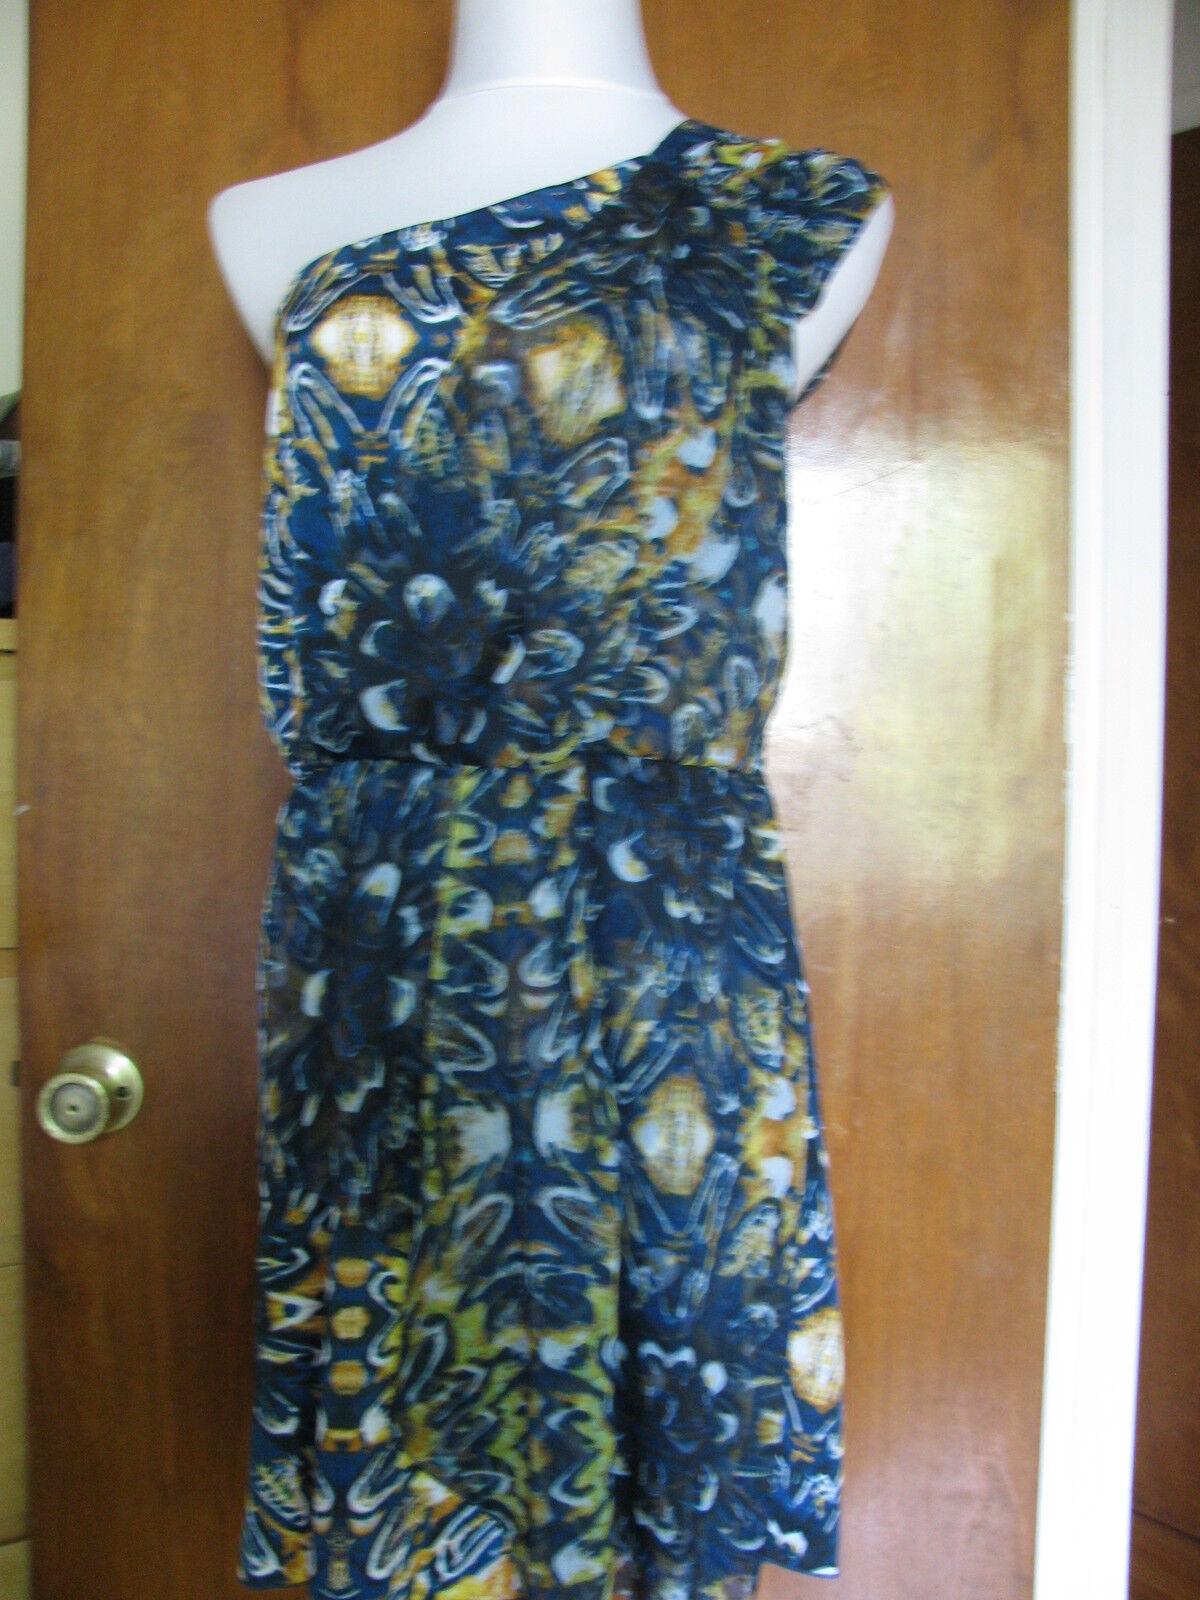 Buffalo damen's one shoulderot teal combo mini dress Größe large NWT